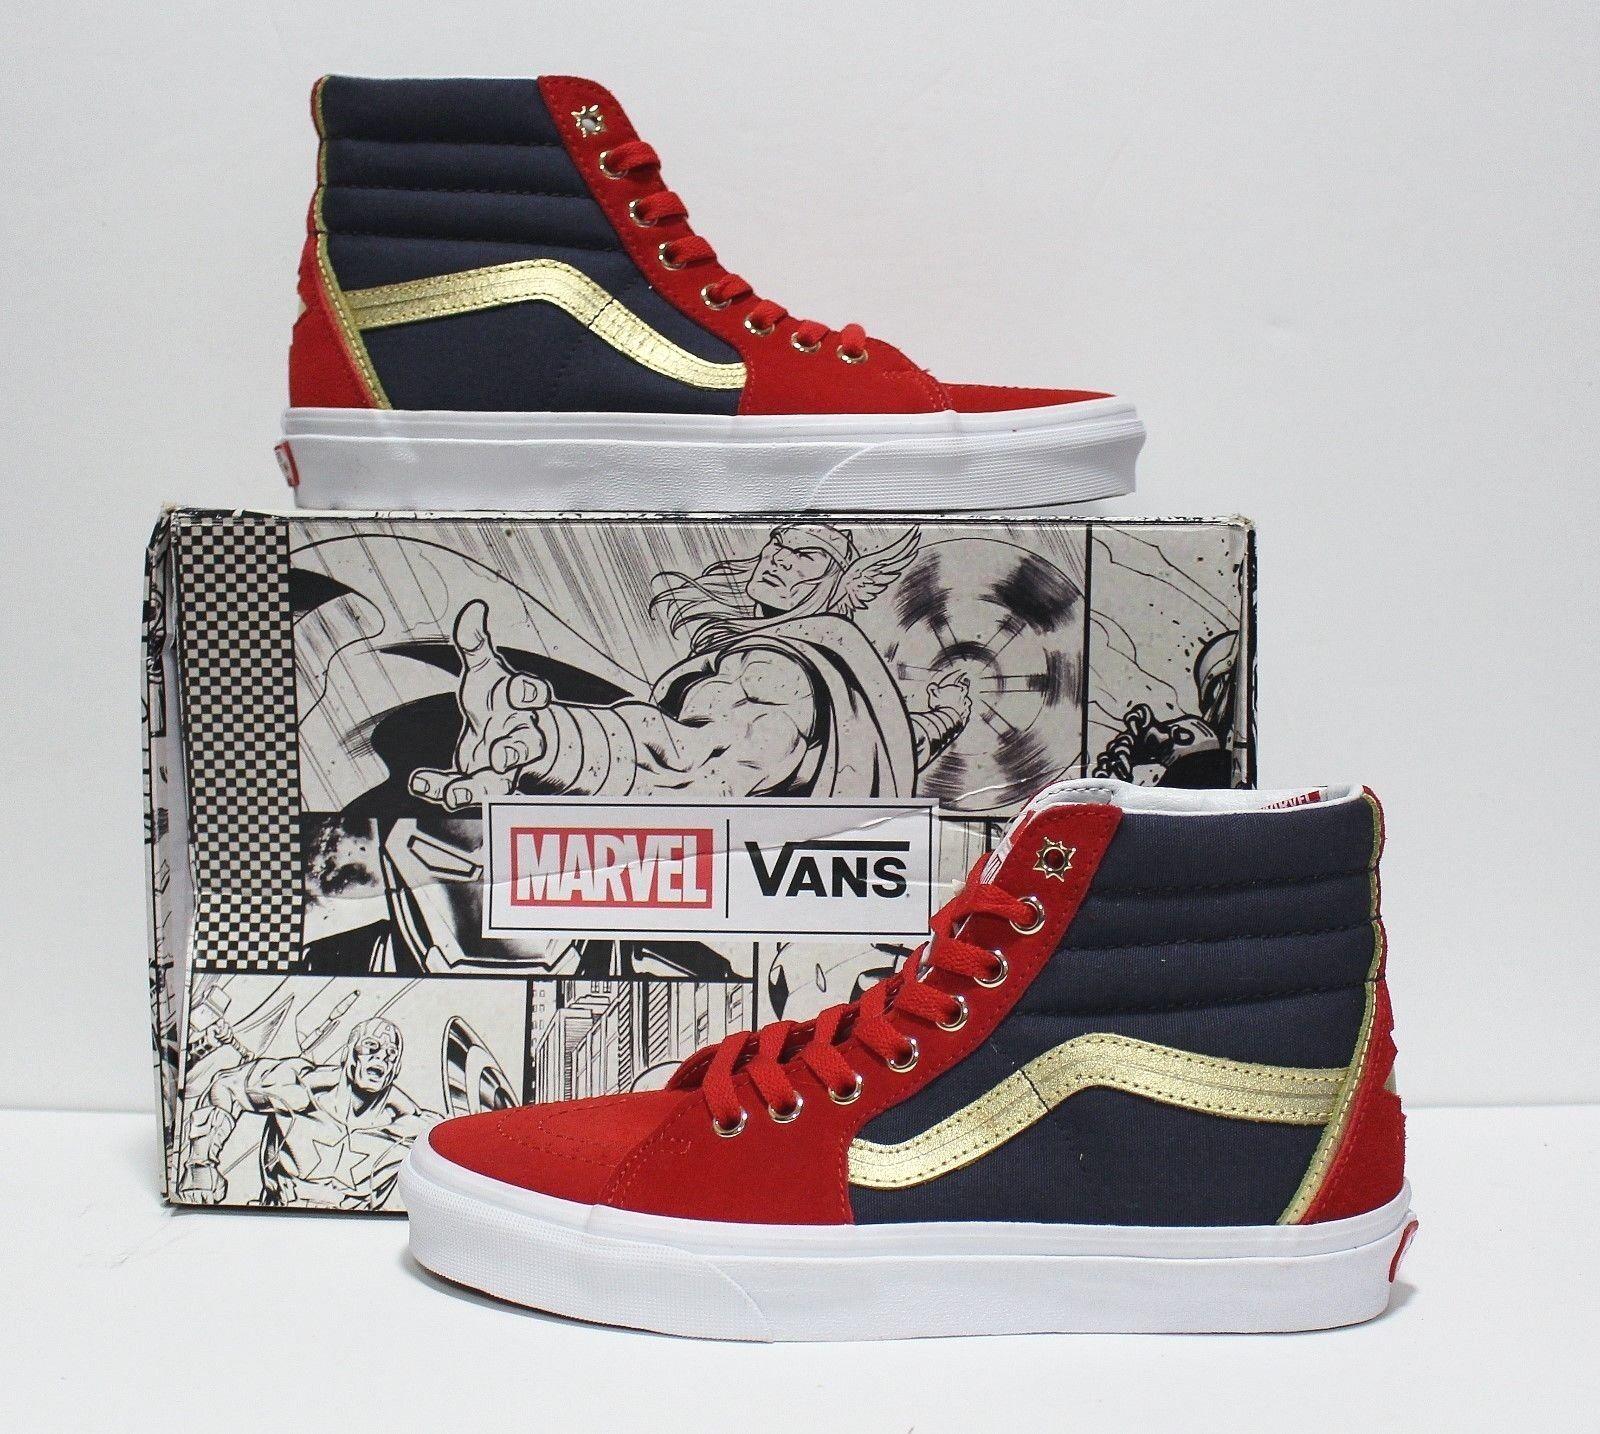 Vans X Marvel SK8 Hi Captain Marvel Women's Size 5.5